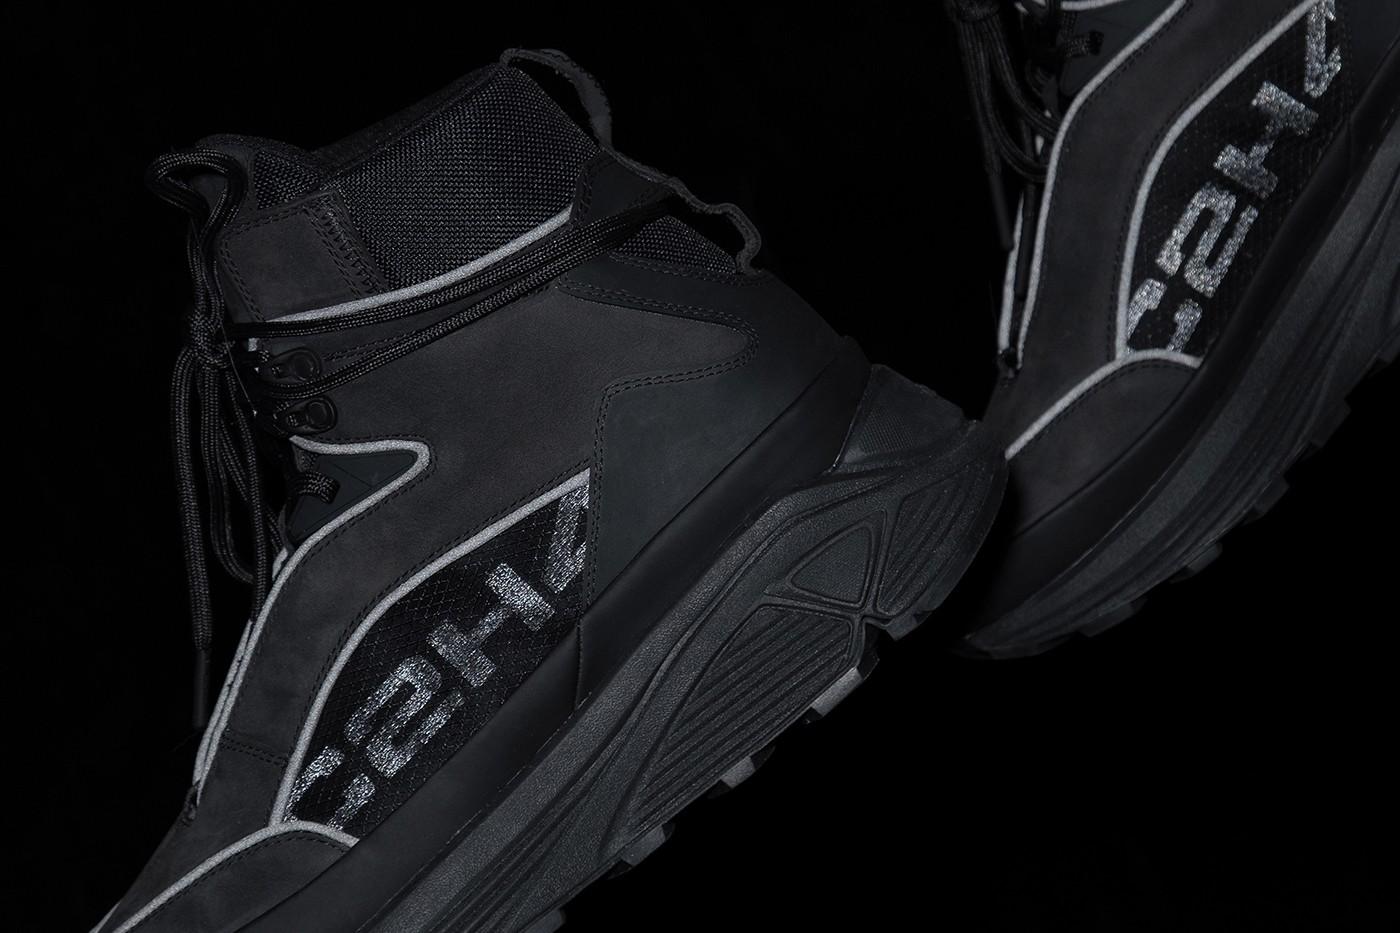 https___hypebeast.com_image_2020_11_c2h4-footwear-atom-alpha-quark-alpha-release-info-007